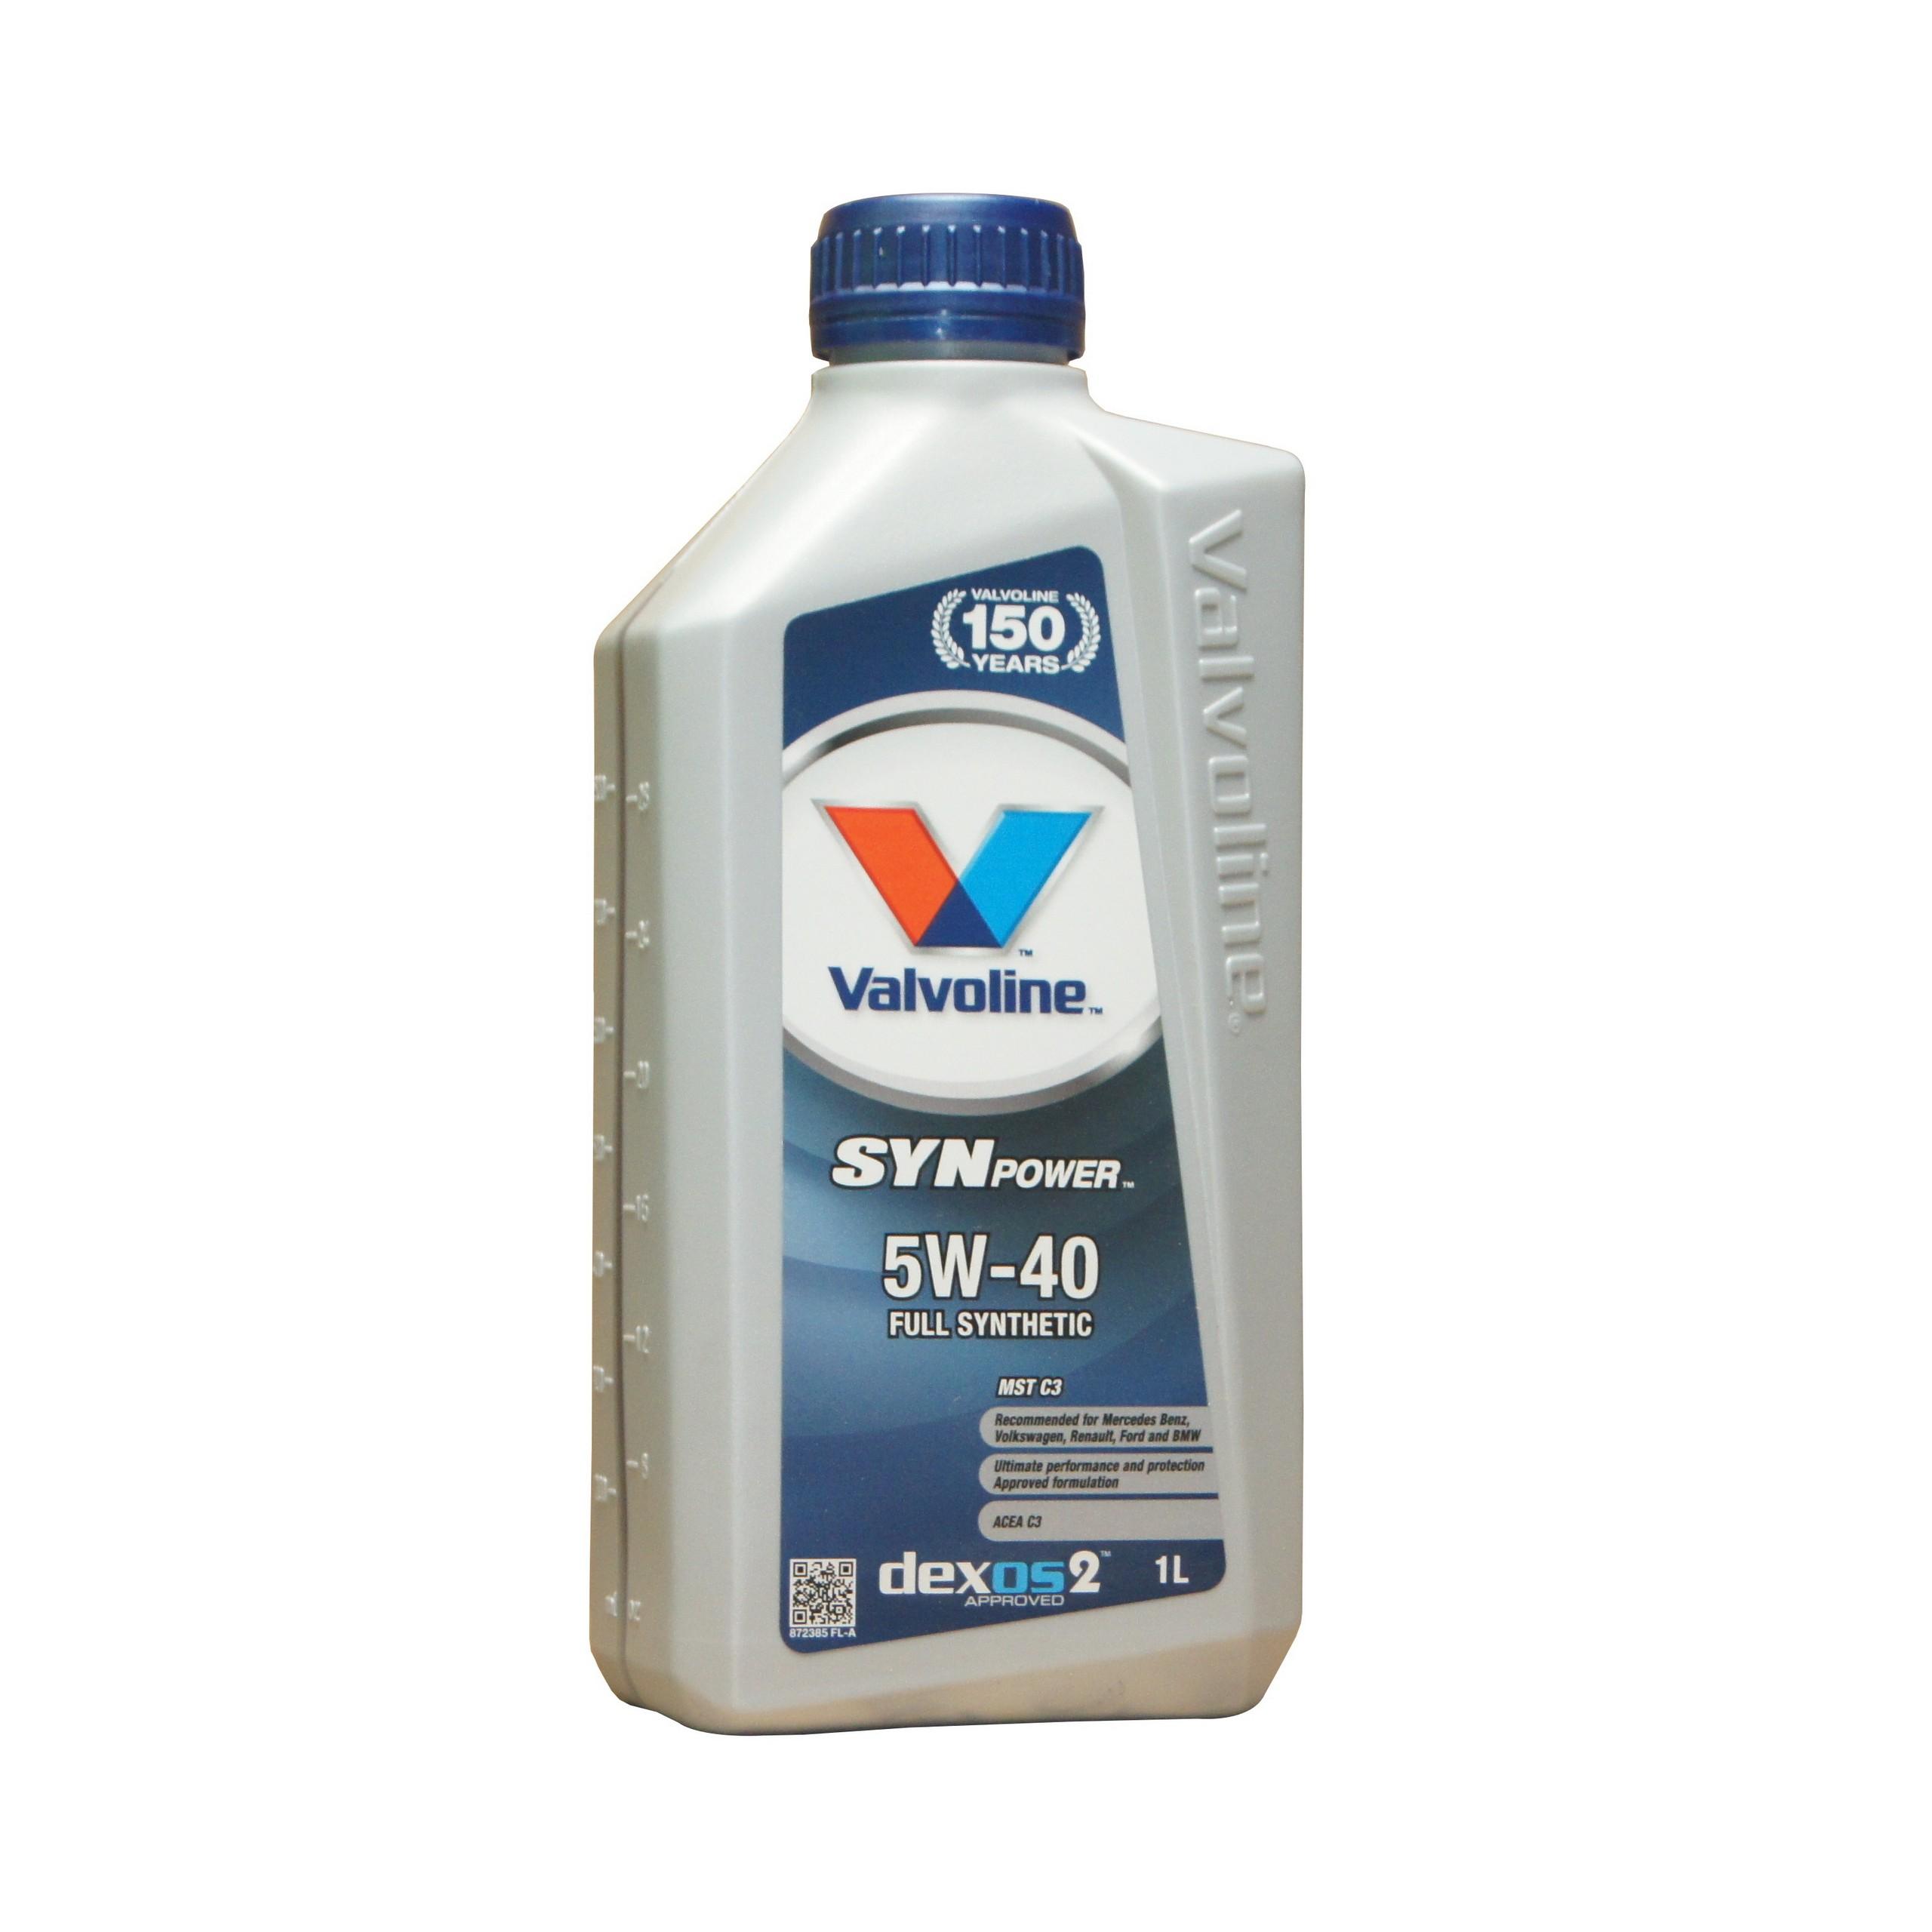 22ab60c2ca69bc VALVOLINE SYNPOWER MST C3 5W40 olej silnikowy 1L 7006004160 - Allegro.pl